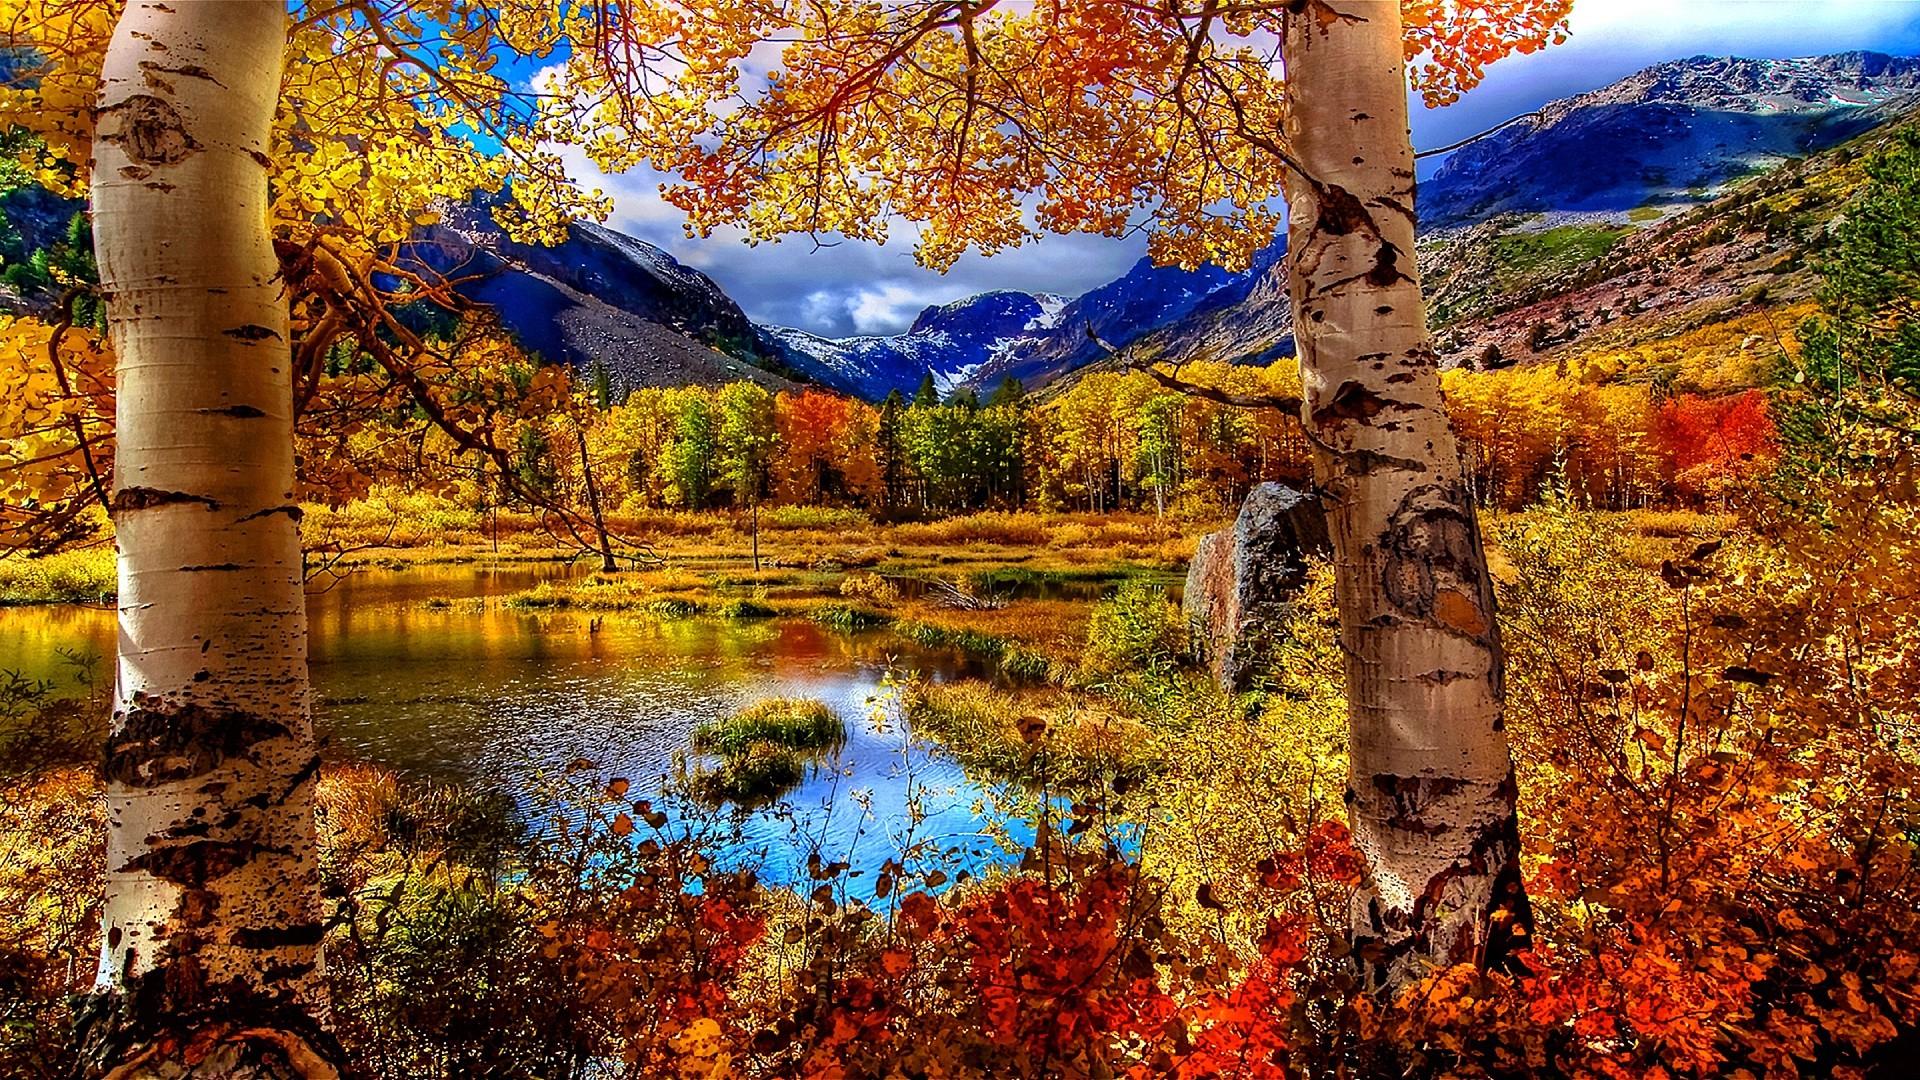 Autumn Scene Wallpapers Wallpaper Cave